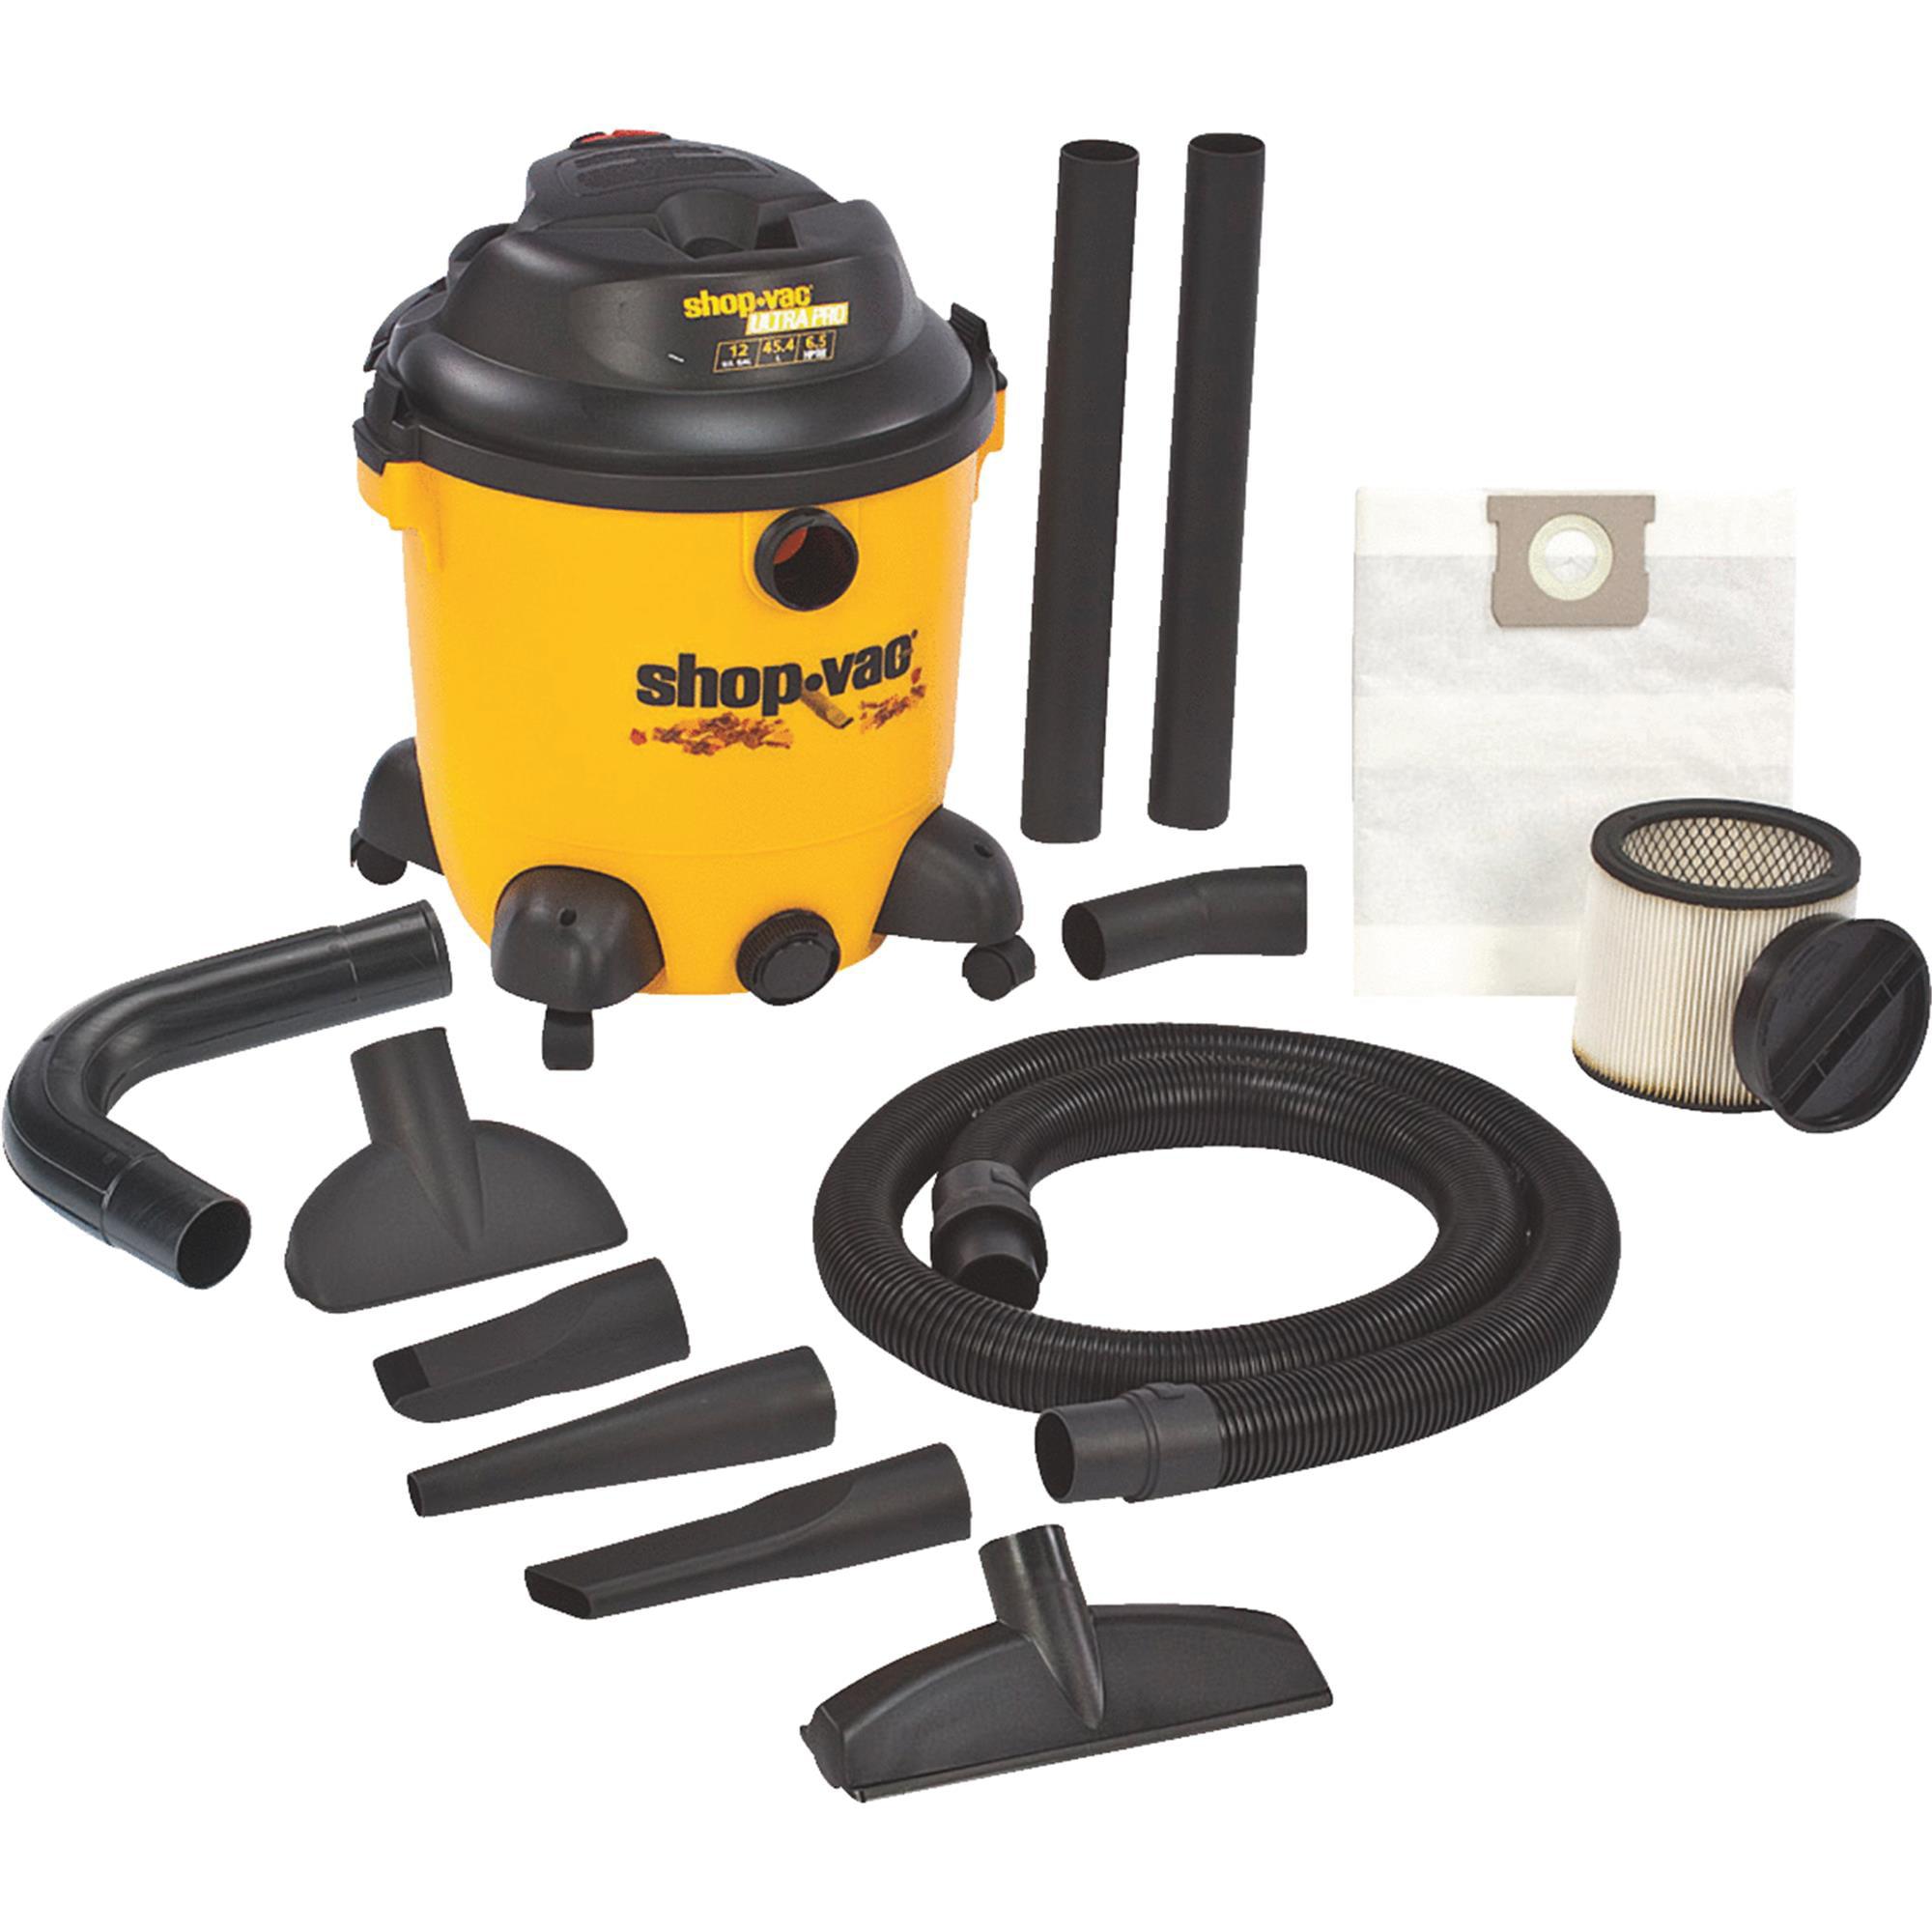 Shop Vac 12 Gal. Blower Wet Dry Vacuum by Shop-Vac